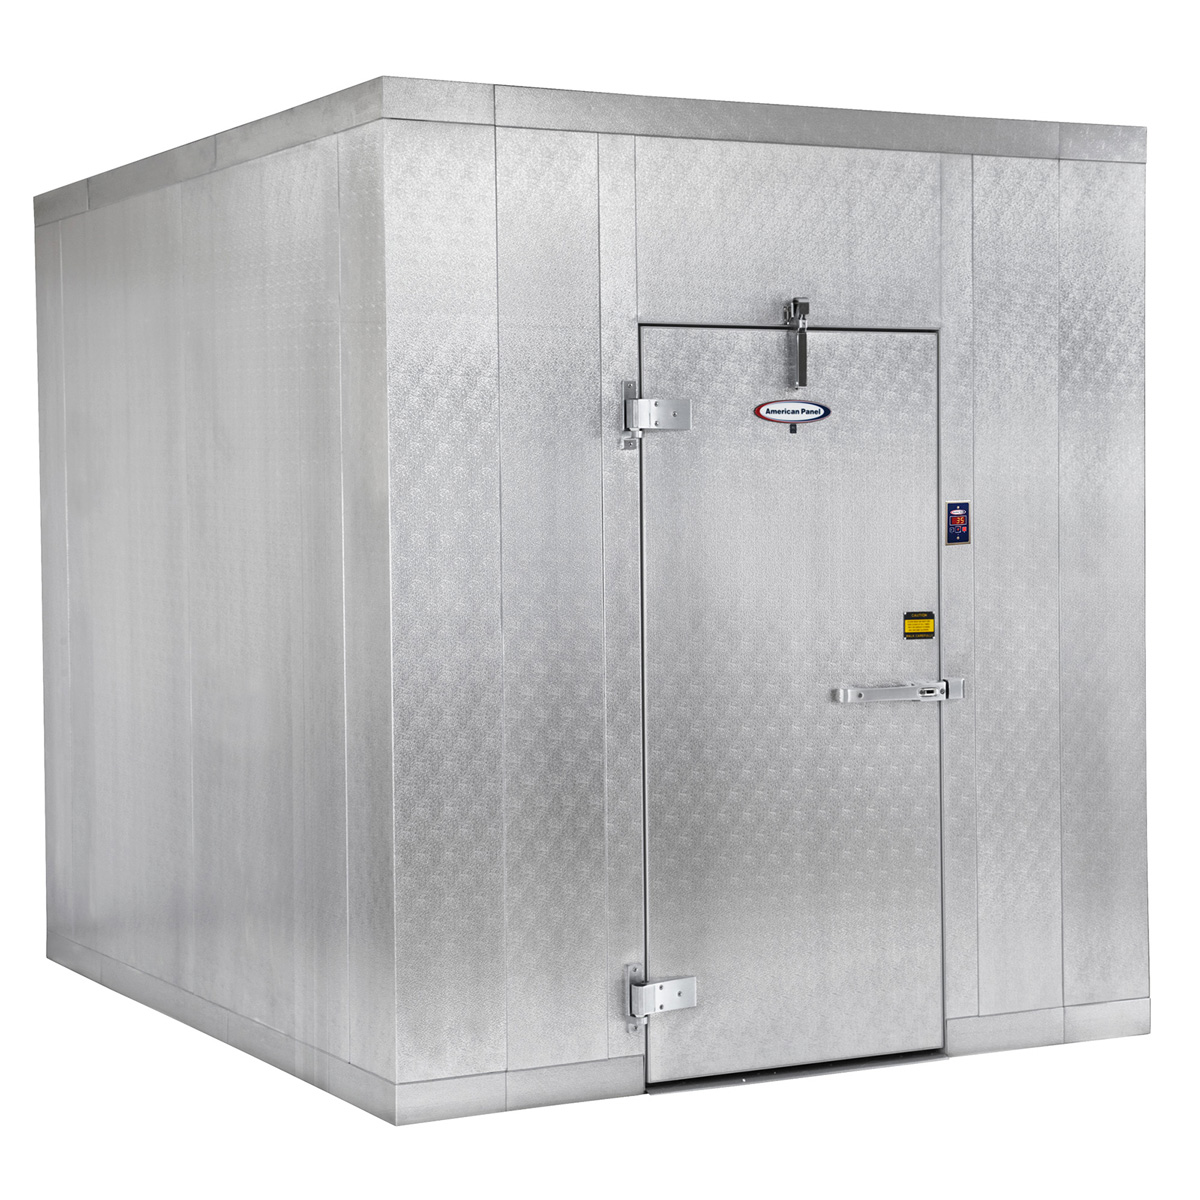 American Panel Corporation 8X8F-O walk in freezer, modular, remote